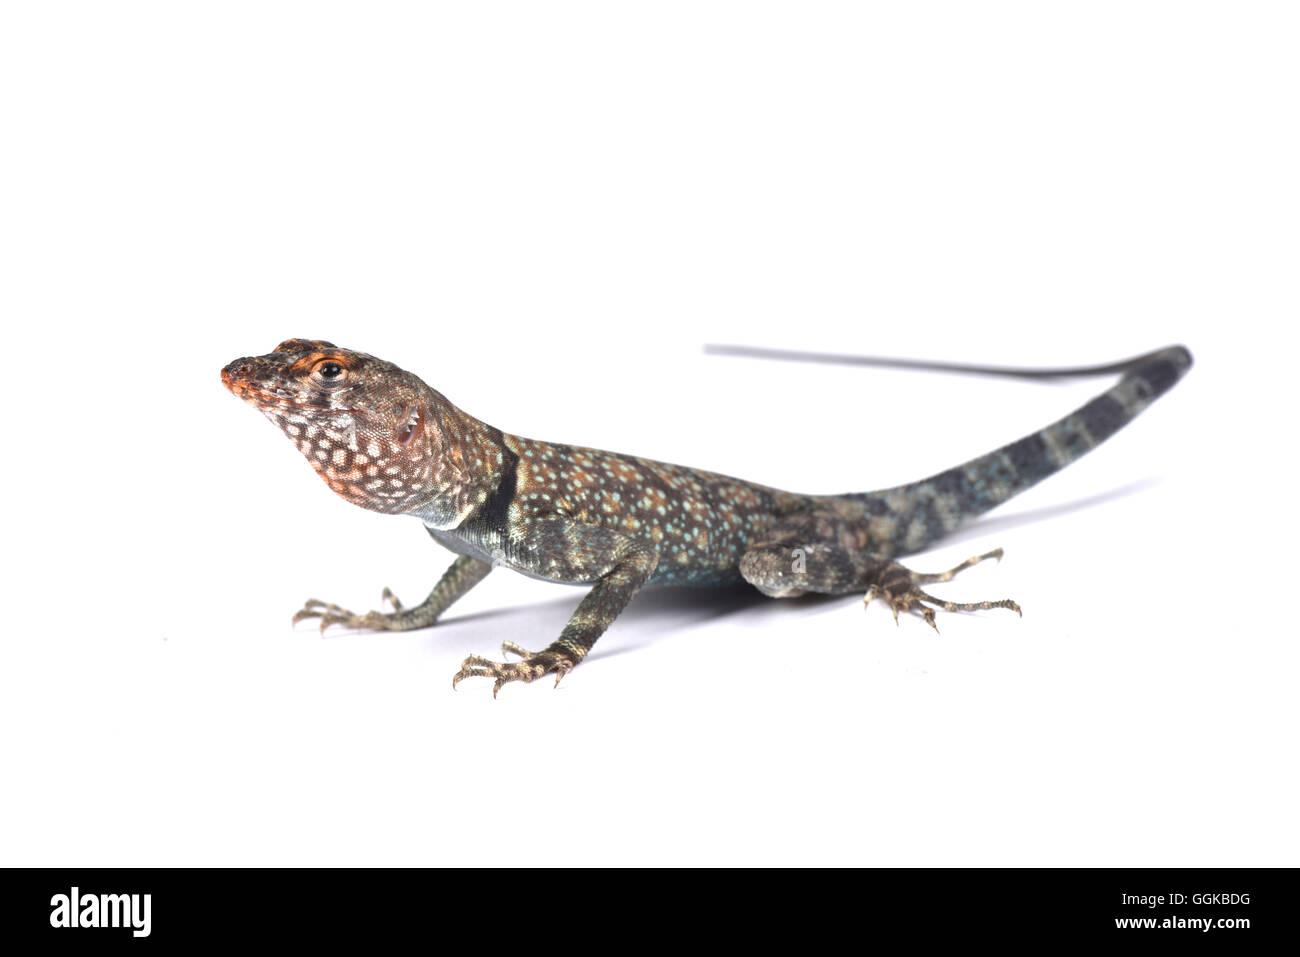 Banded Rock Lizard  (Petrosaurus mearnsi) - Stock Image